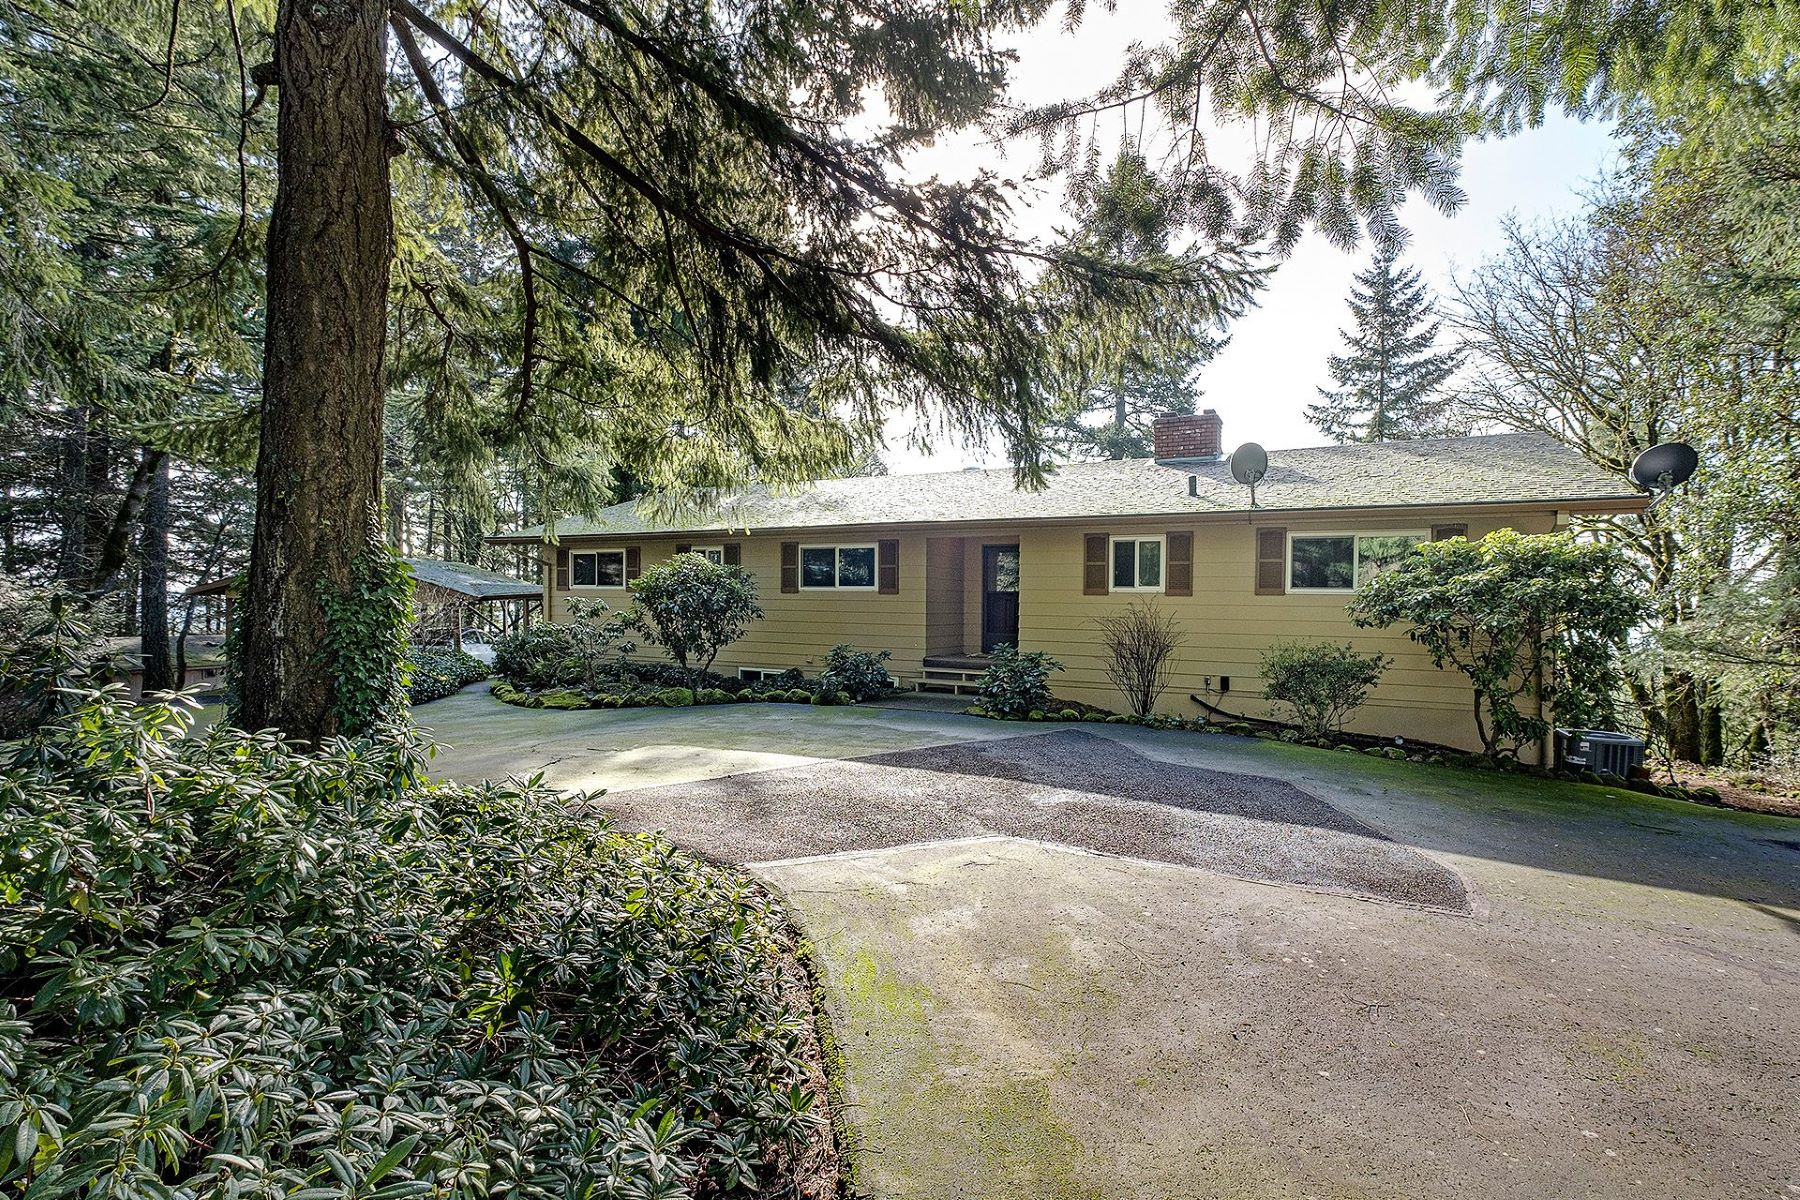 Other Residential Homes για την Πώληση στο 17400 NE HILLSBORO HWY Newberg, OR 97132 Newberg, Ορεγκον 97132 Ηνωμένες Πολιτείες